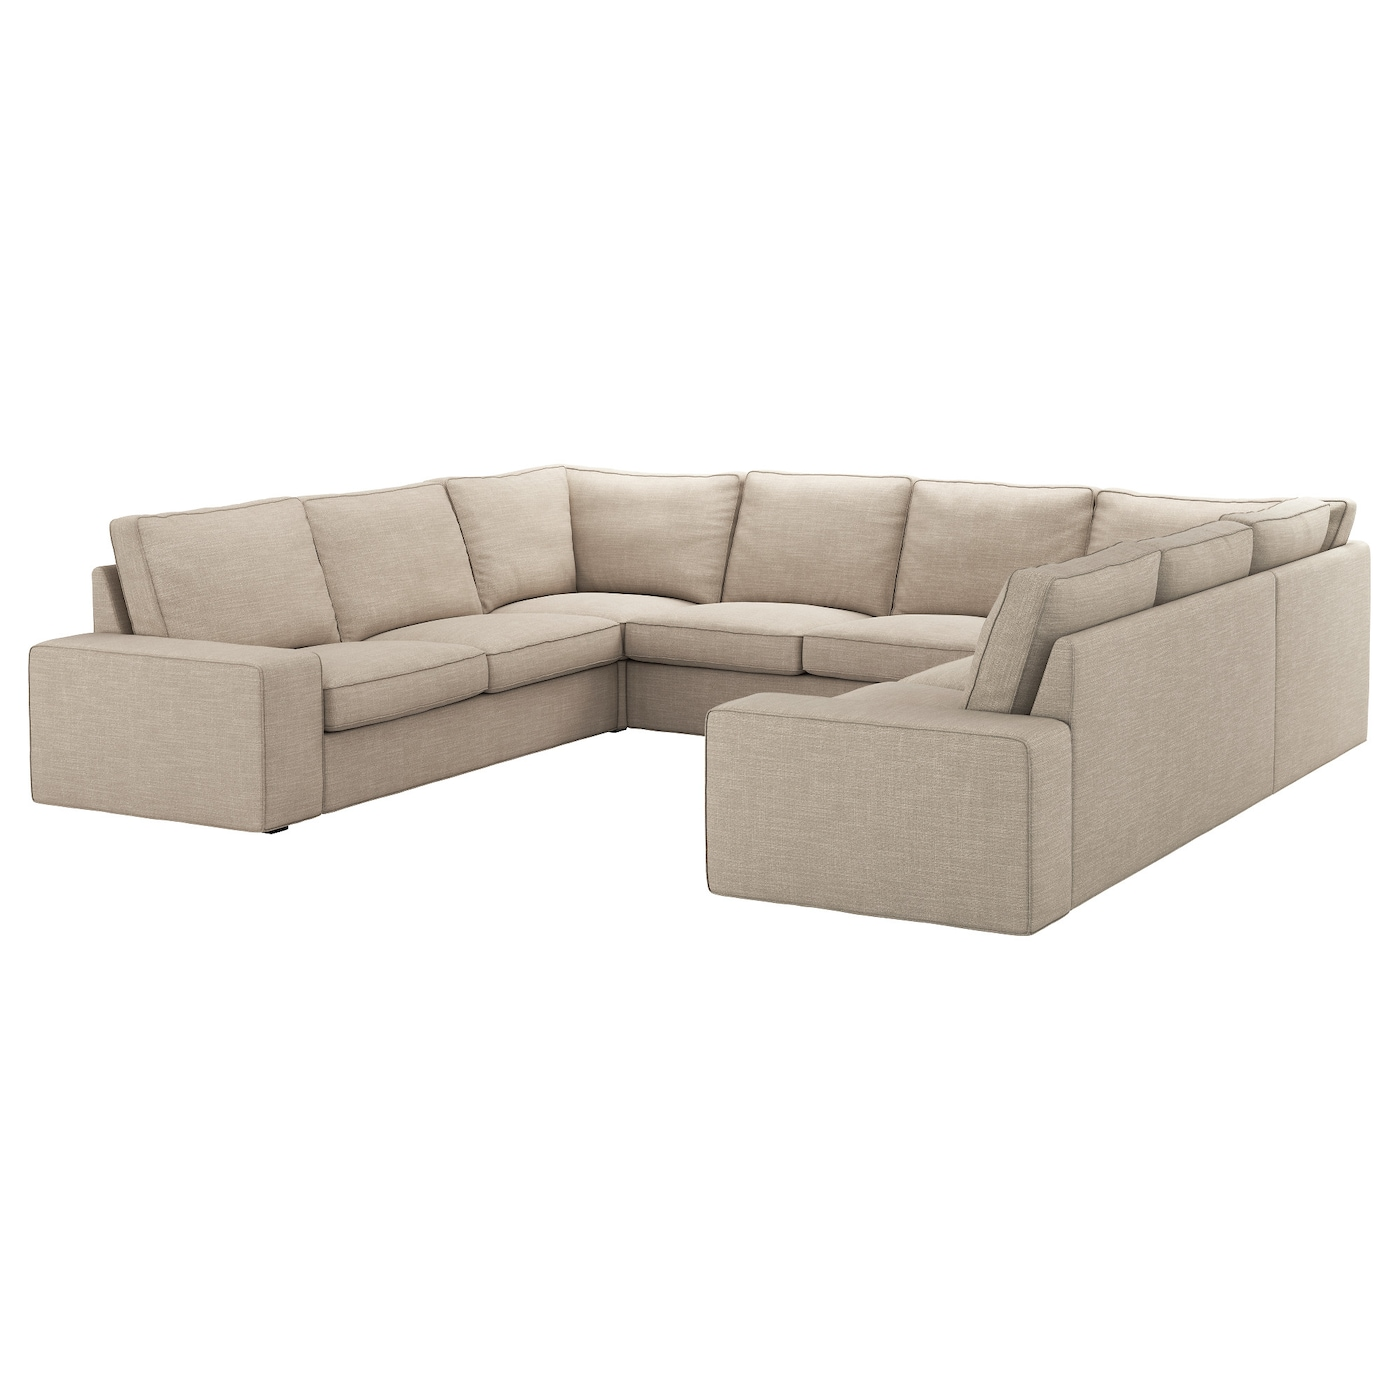 Bon IKEA KIVIK U Shaped Sofa, 6 Seat 10 Year Guarantee. Read About The